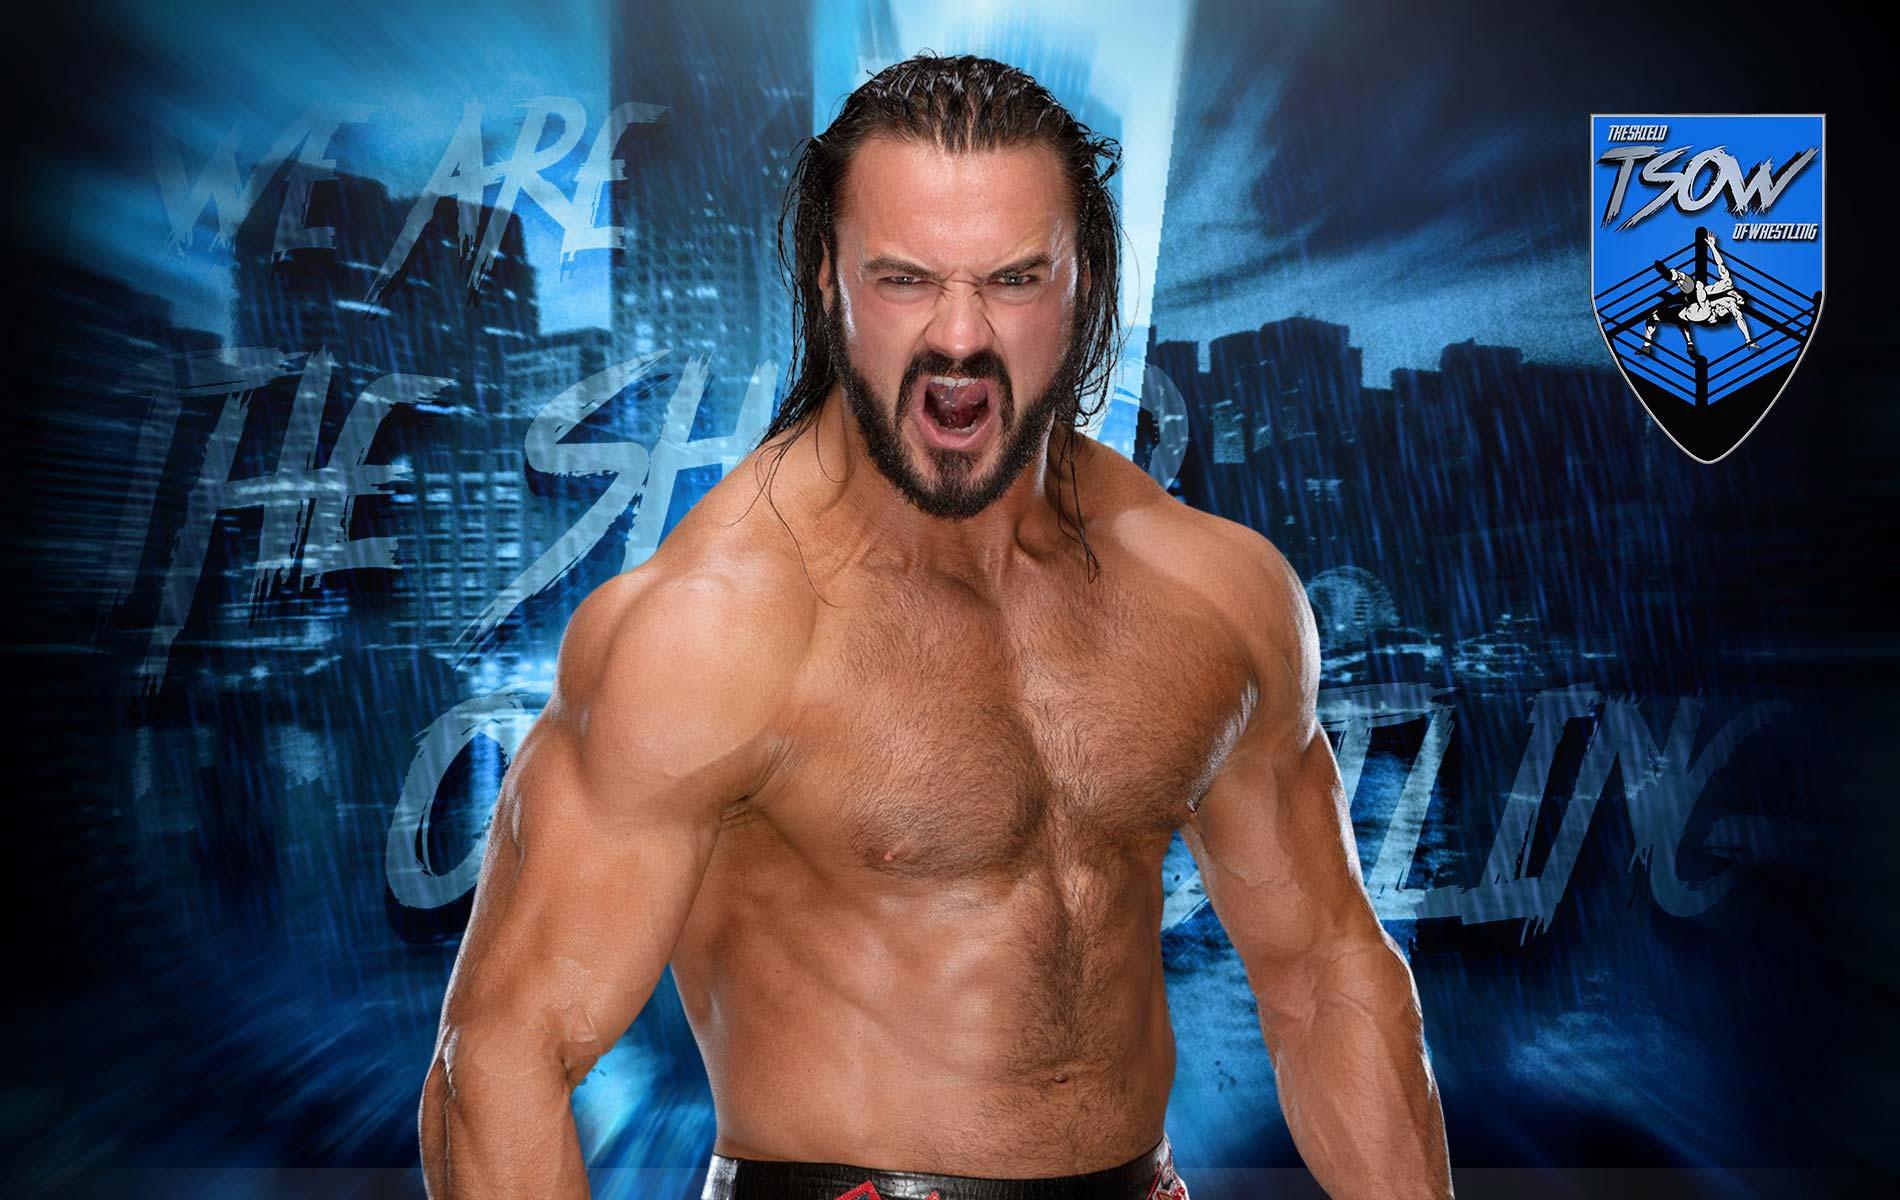 Drew McIntyre è già pronto per lottare in NJPW?